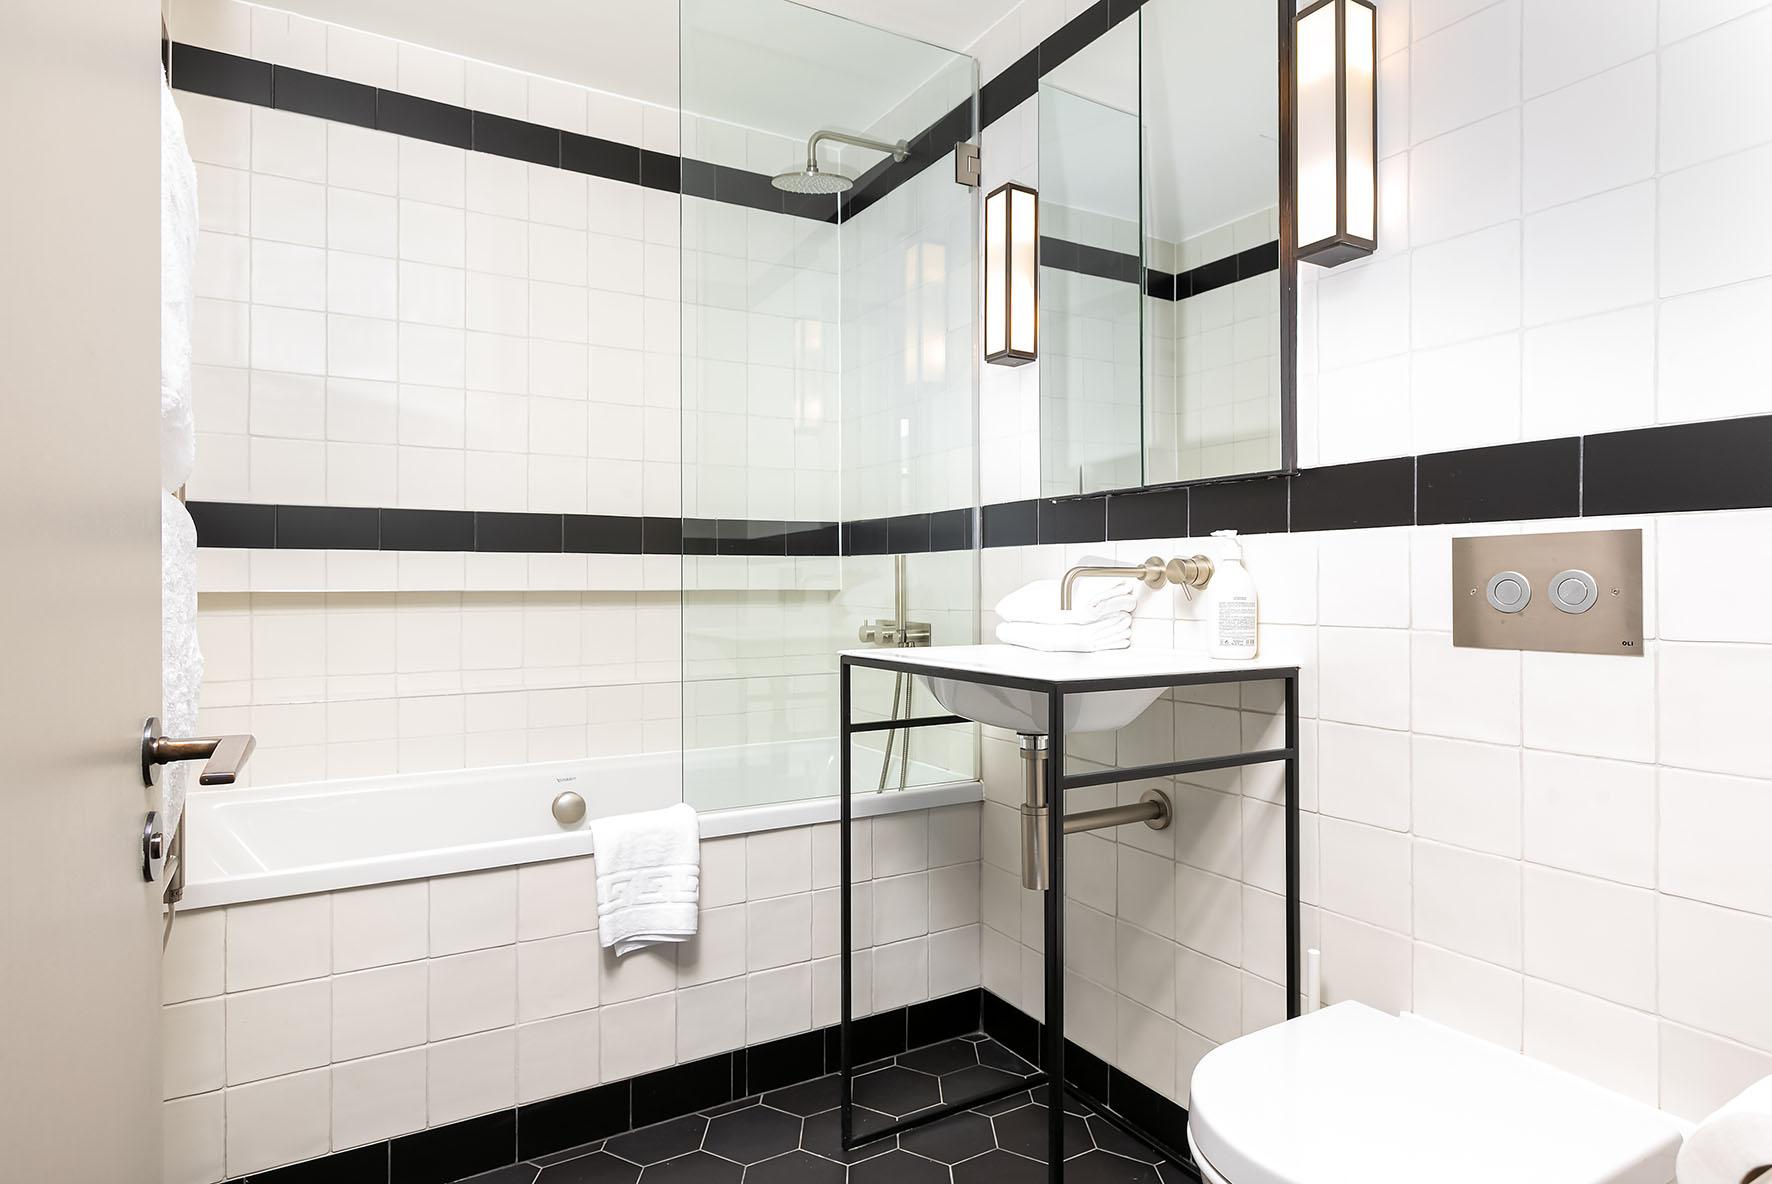 Lovelydays luxury service apartment rental - London - Soho - Oxford Street V - Lovelysuite - 1 bedrooms - 1 bathrooms - Beautiful bathtub - 516868838ae7 - Lovelydays